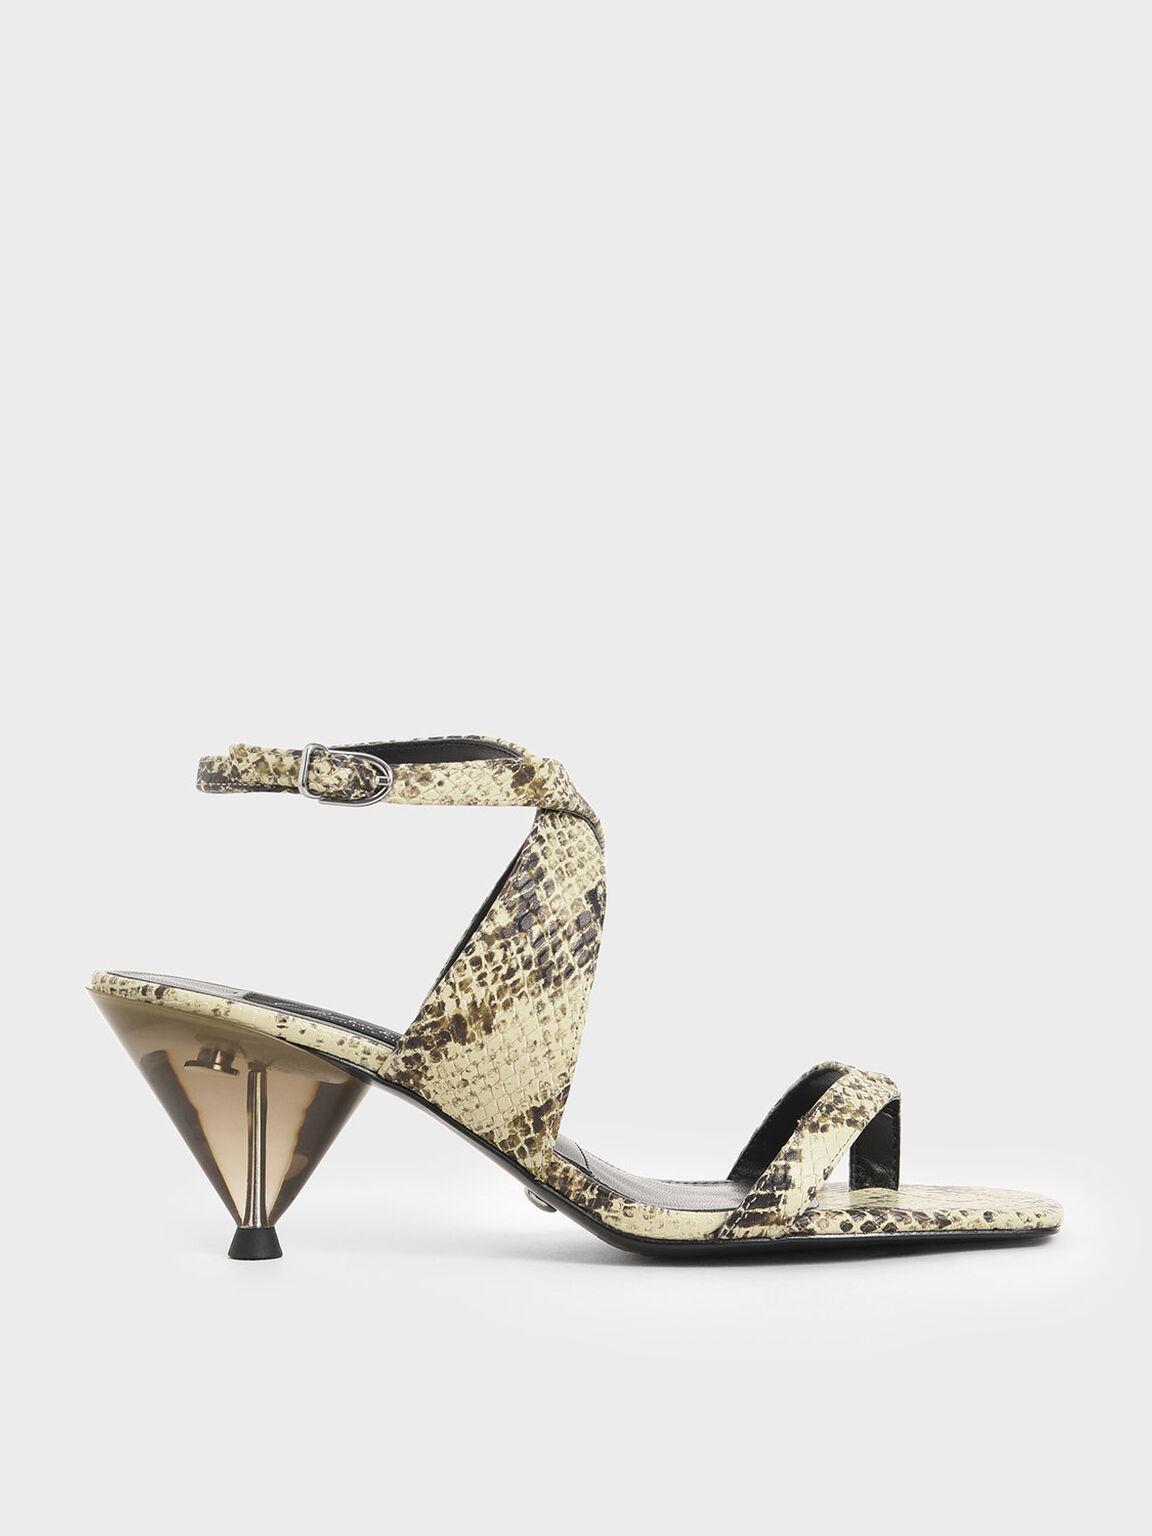 Leather Snake Print Cone Heel Sandals, Multi, hi-res